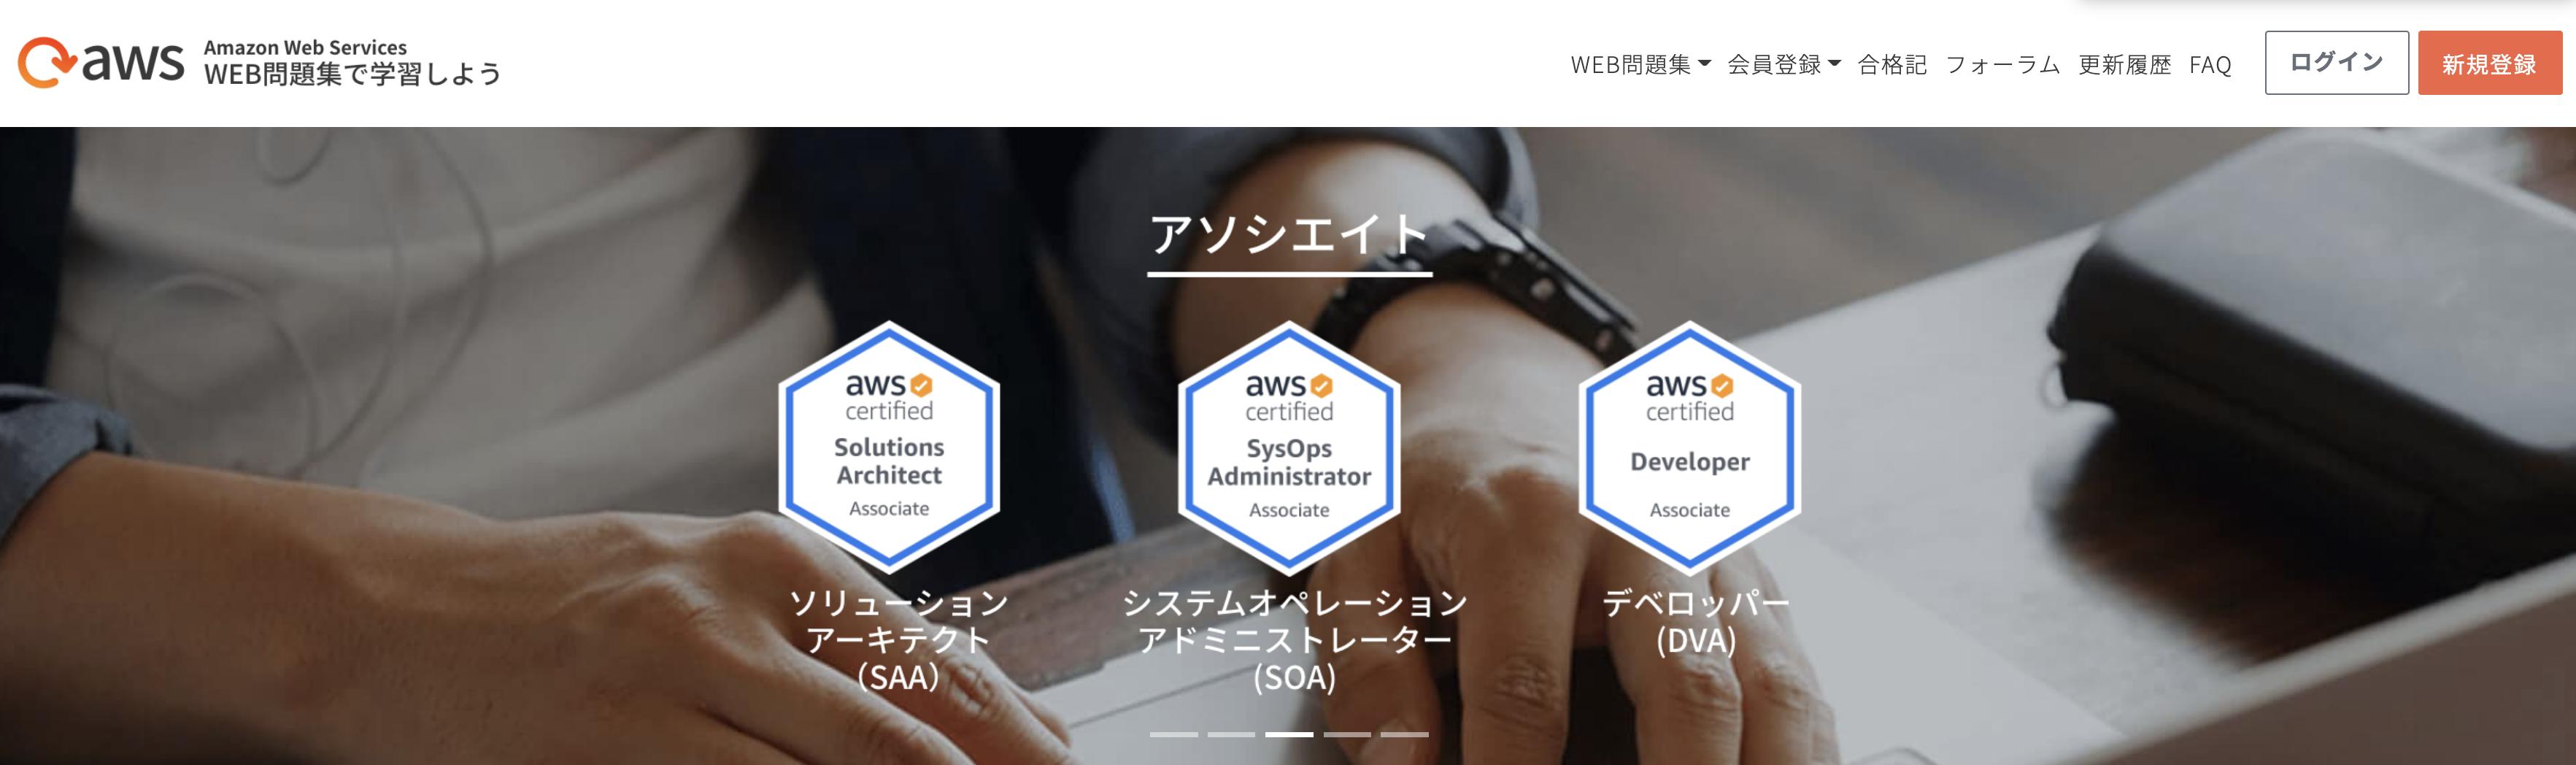 AWS WEB問題集サイト